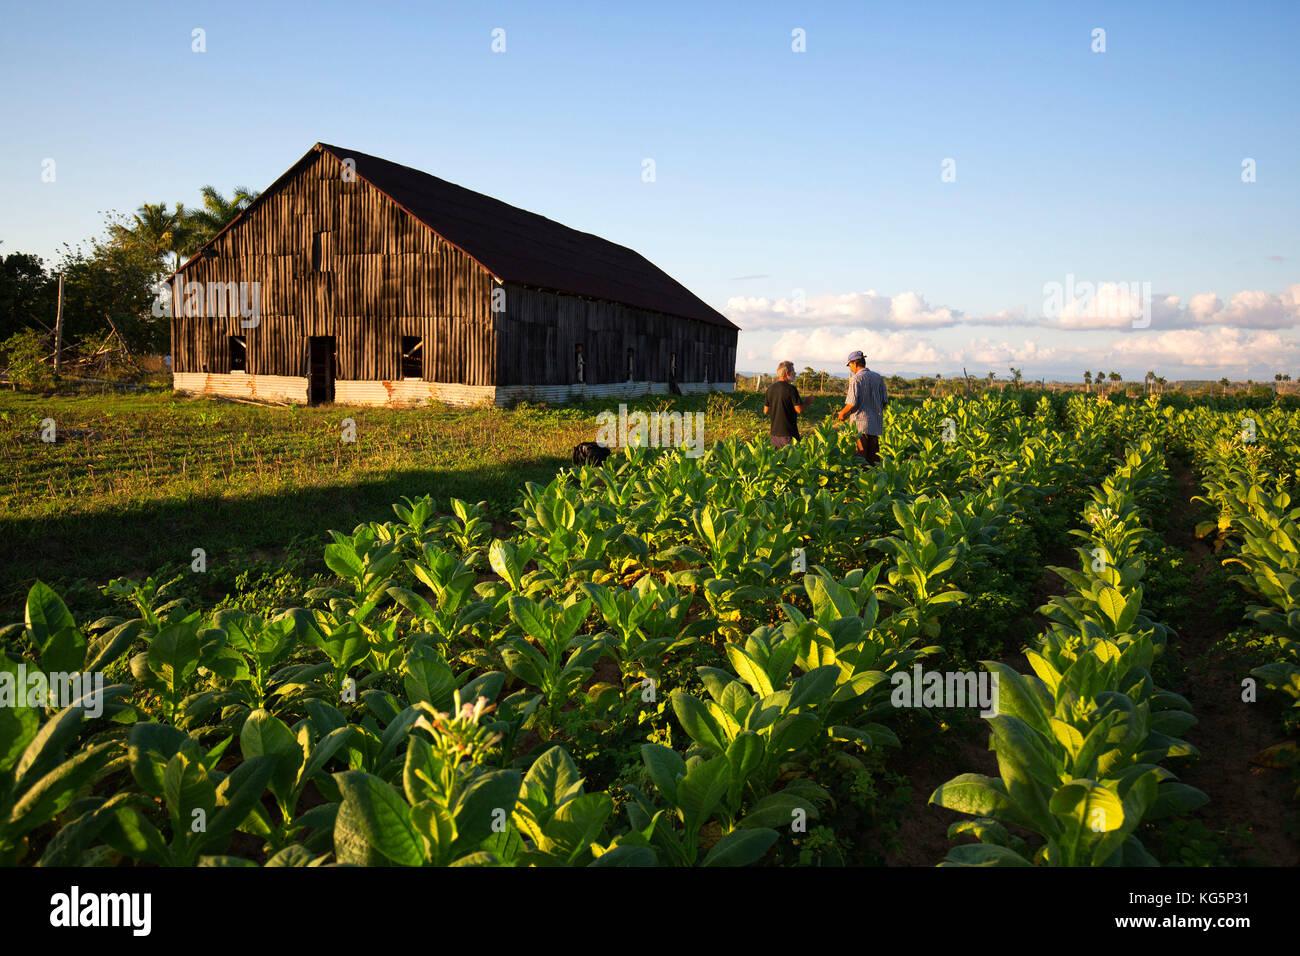 Cuba, Republic of Cuba, Central America, Caribbean Island. Havana district. Tobacco farm in Pinal dal Rio, man, - Stock Image